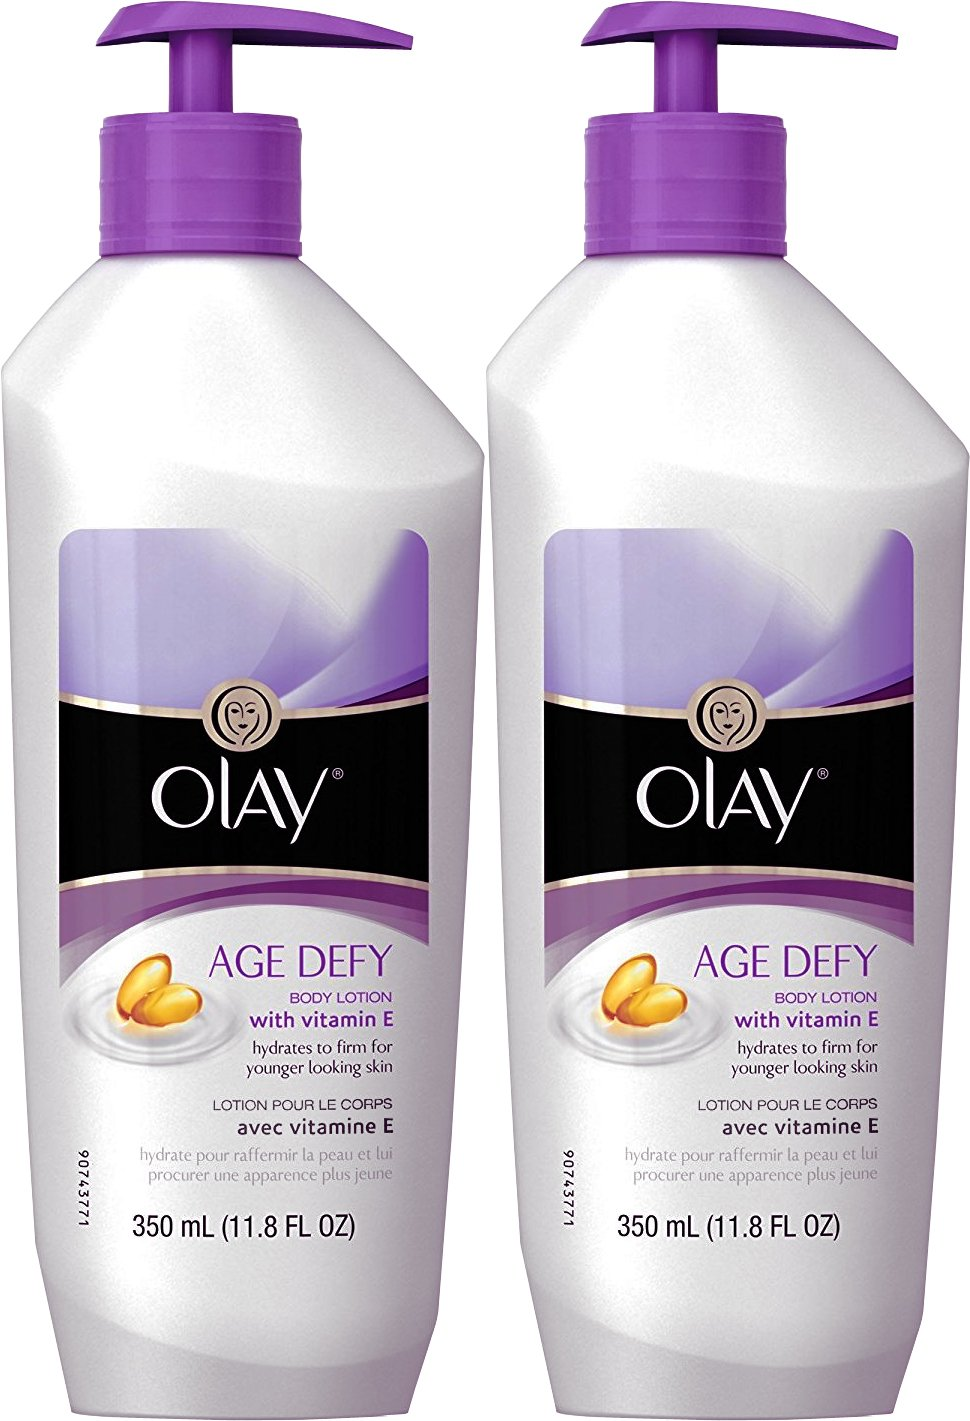 Olay Age Defy Body Lotion Ultra Moisture, 11.80 oz, 2 Pack